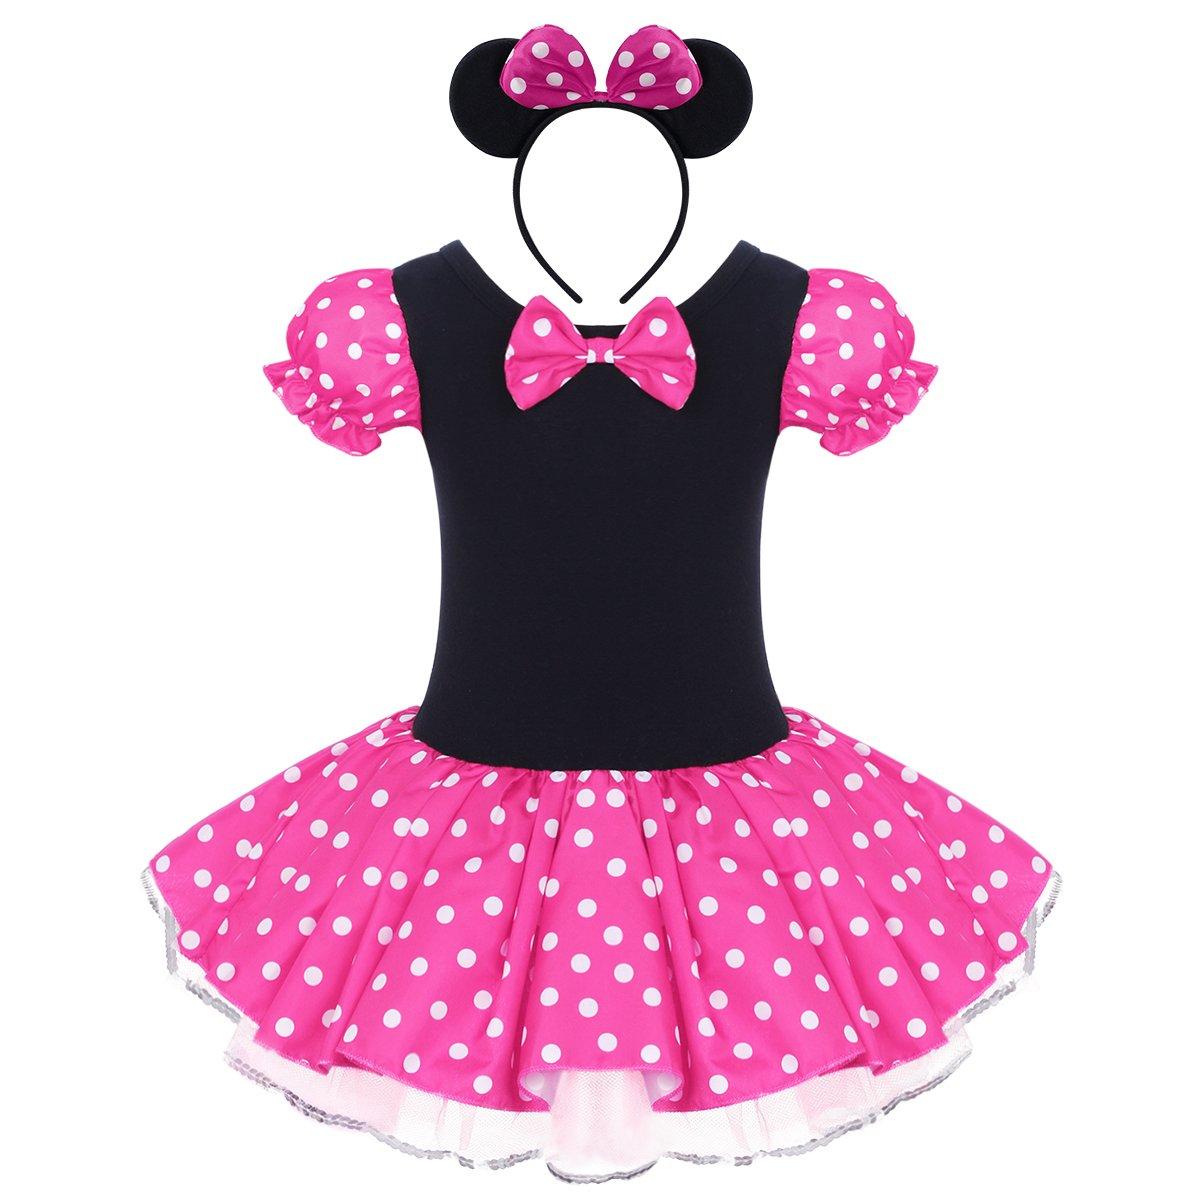 Kid Girl Minnie Costume Tutu Dress Ear Headband Outfit Summer Puff Sleeve Polka Dot Ruffle Bowknot Christmas Halloween Dress Up # Hot Pink 4-5 Years